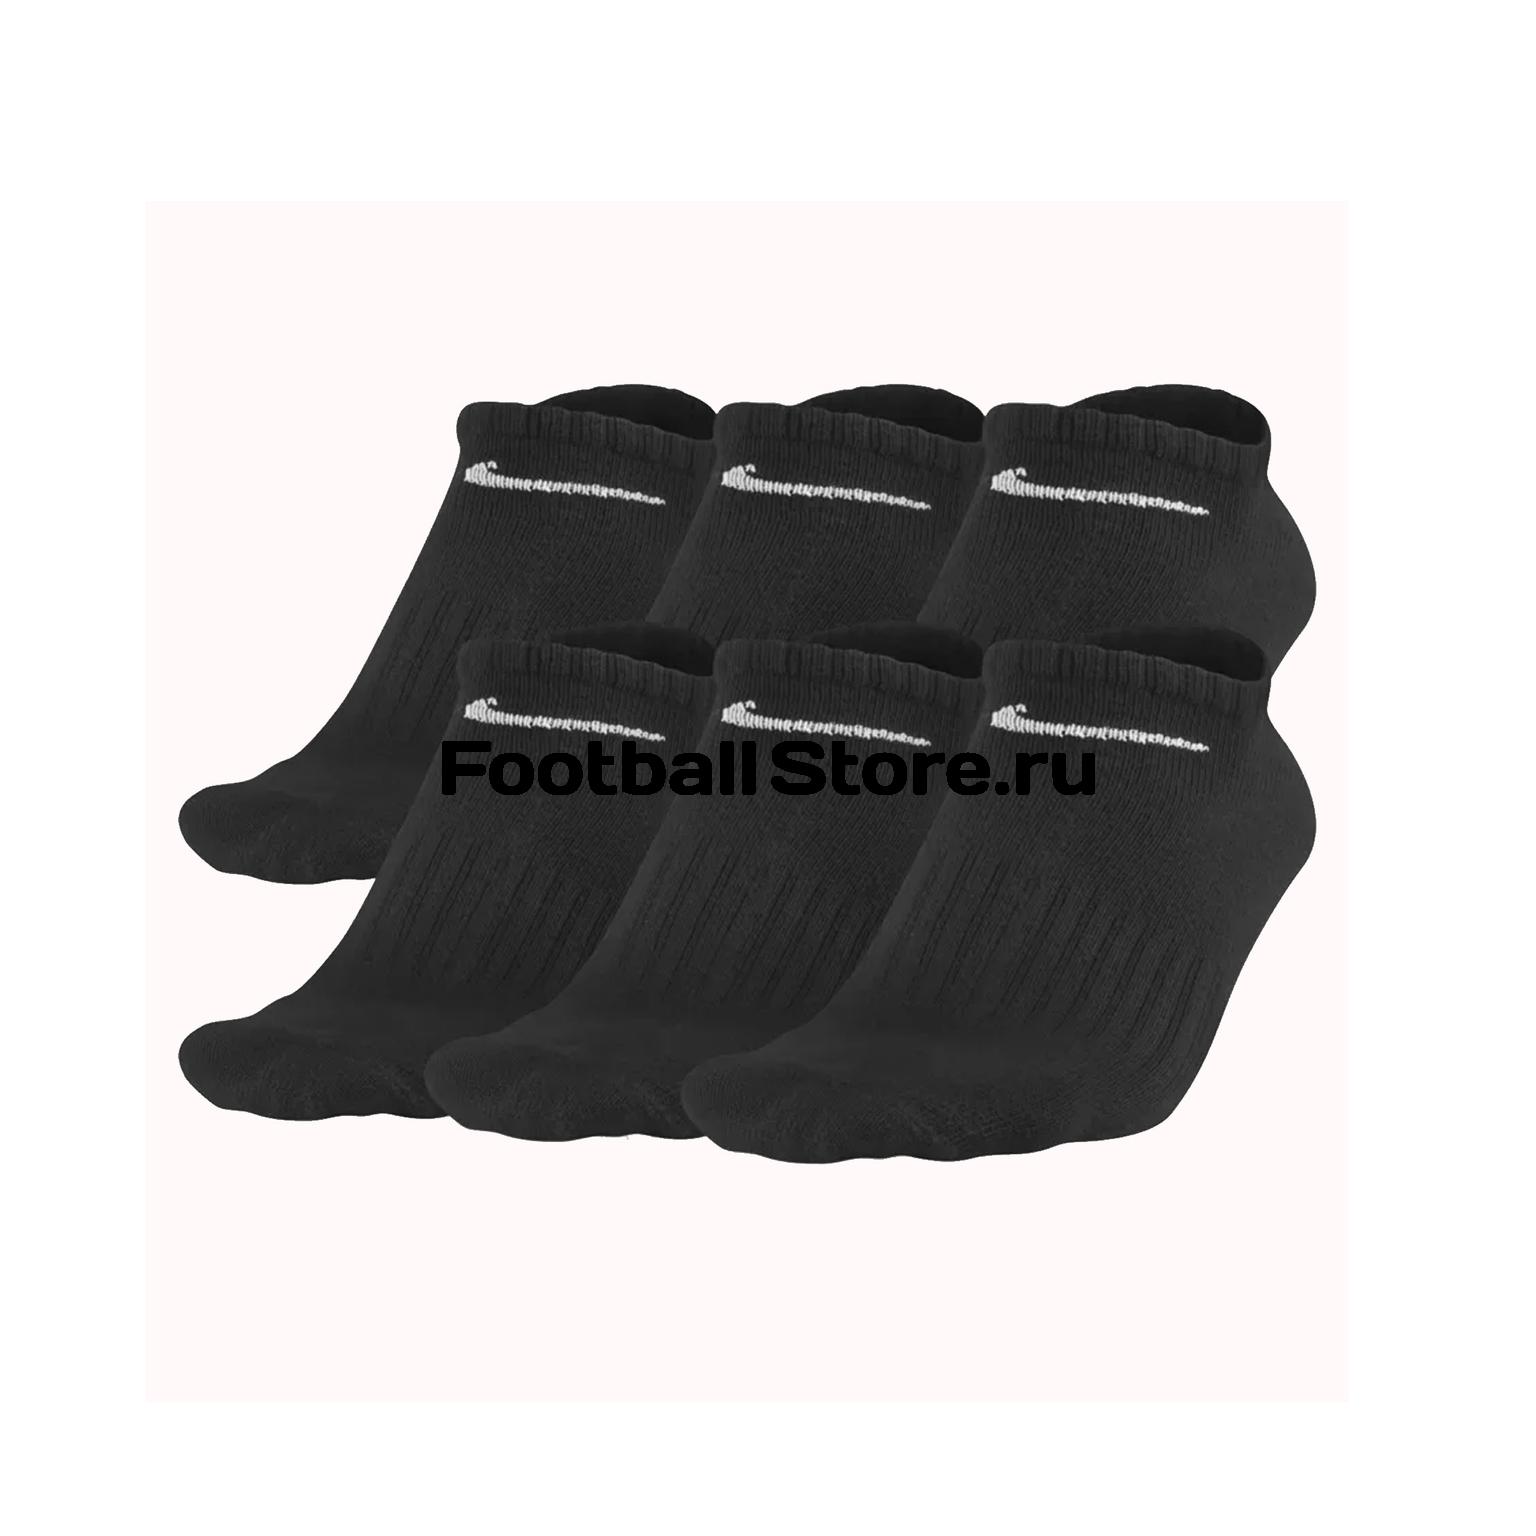 Комплект носков Nike 6PR SX4466-001 комплект носков nike 3ppk lightweight сrew sx4704 901